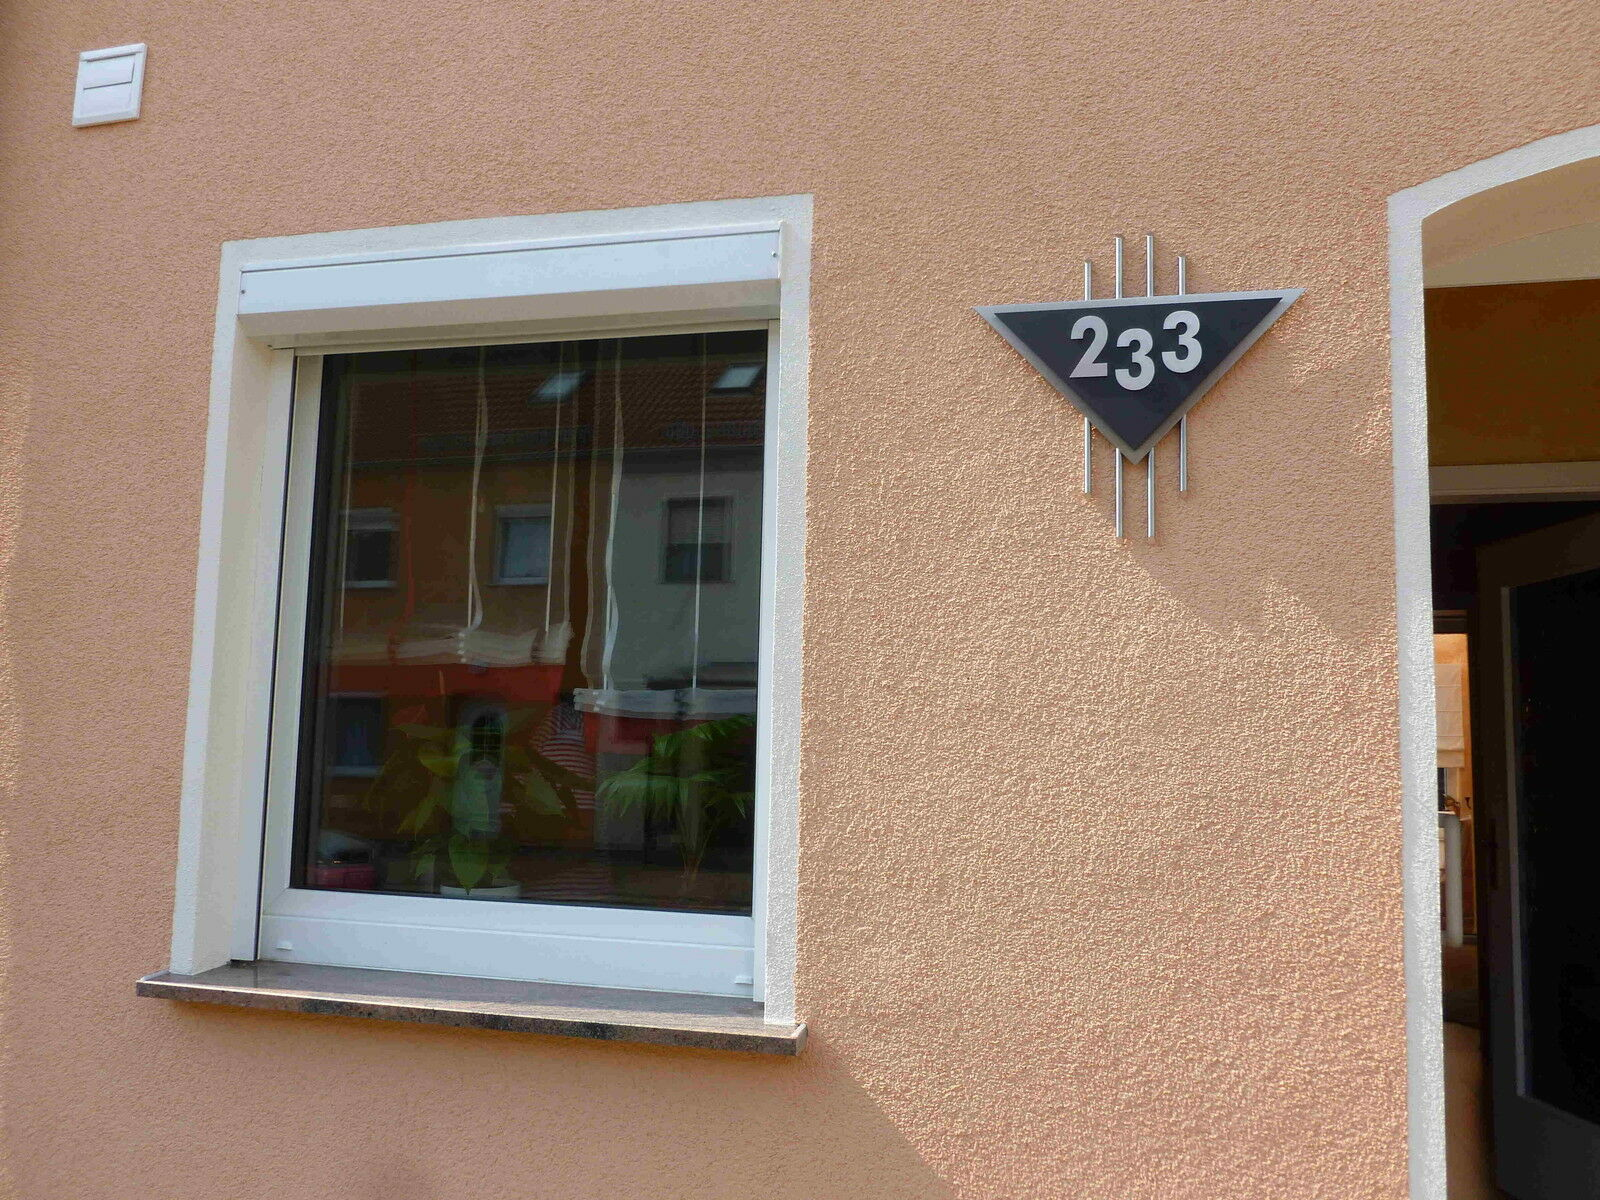 Hausnummer Edelstahl schwarz Venus 0-9 a b c d e e e f g h A B C D E F G H V2A | Hohe Qualität  | Bestellungen Sind Willkommen  | Sale Deutschland  d90644